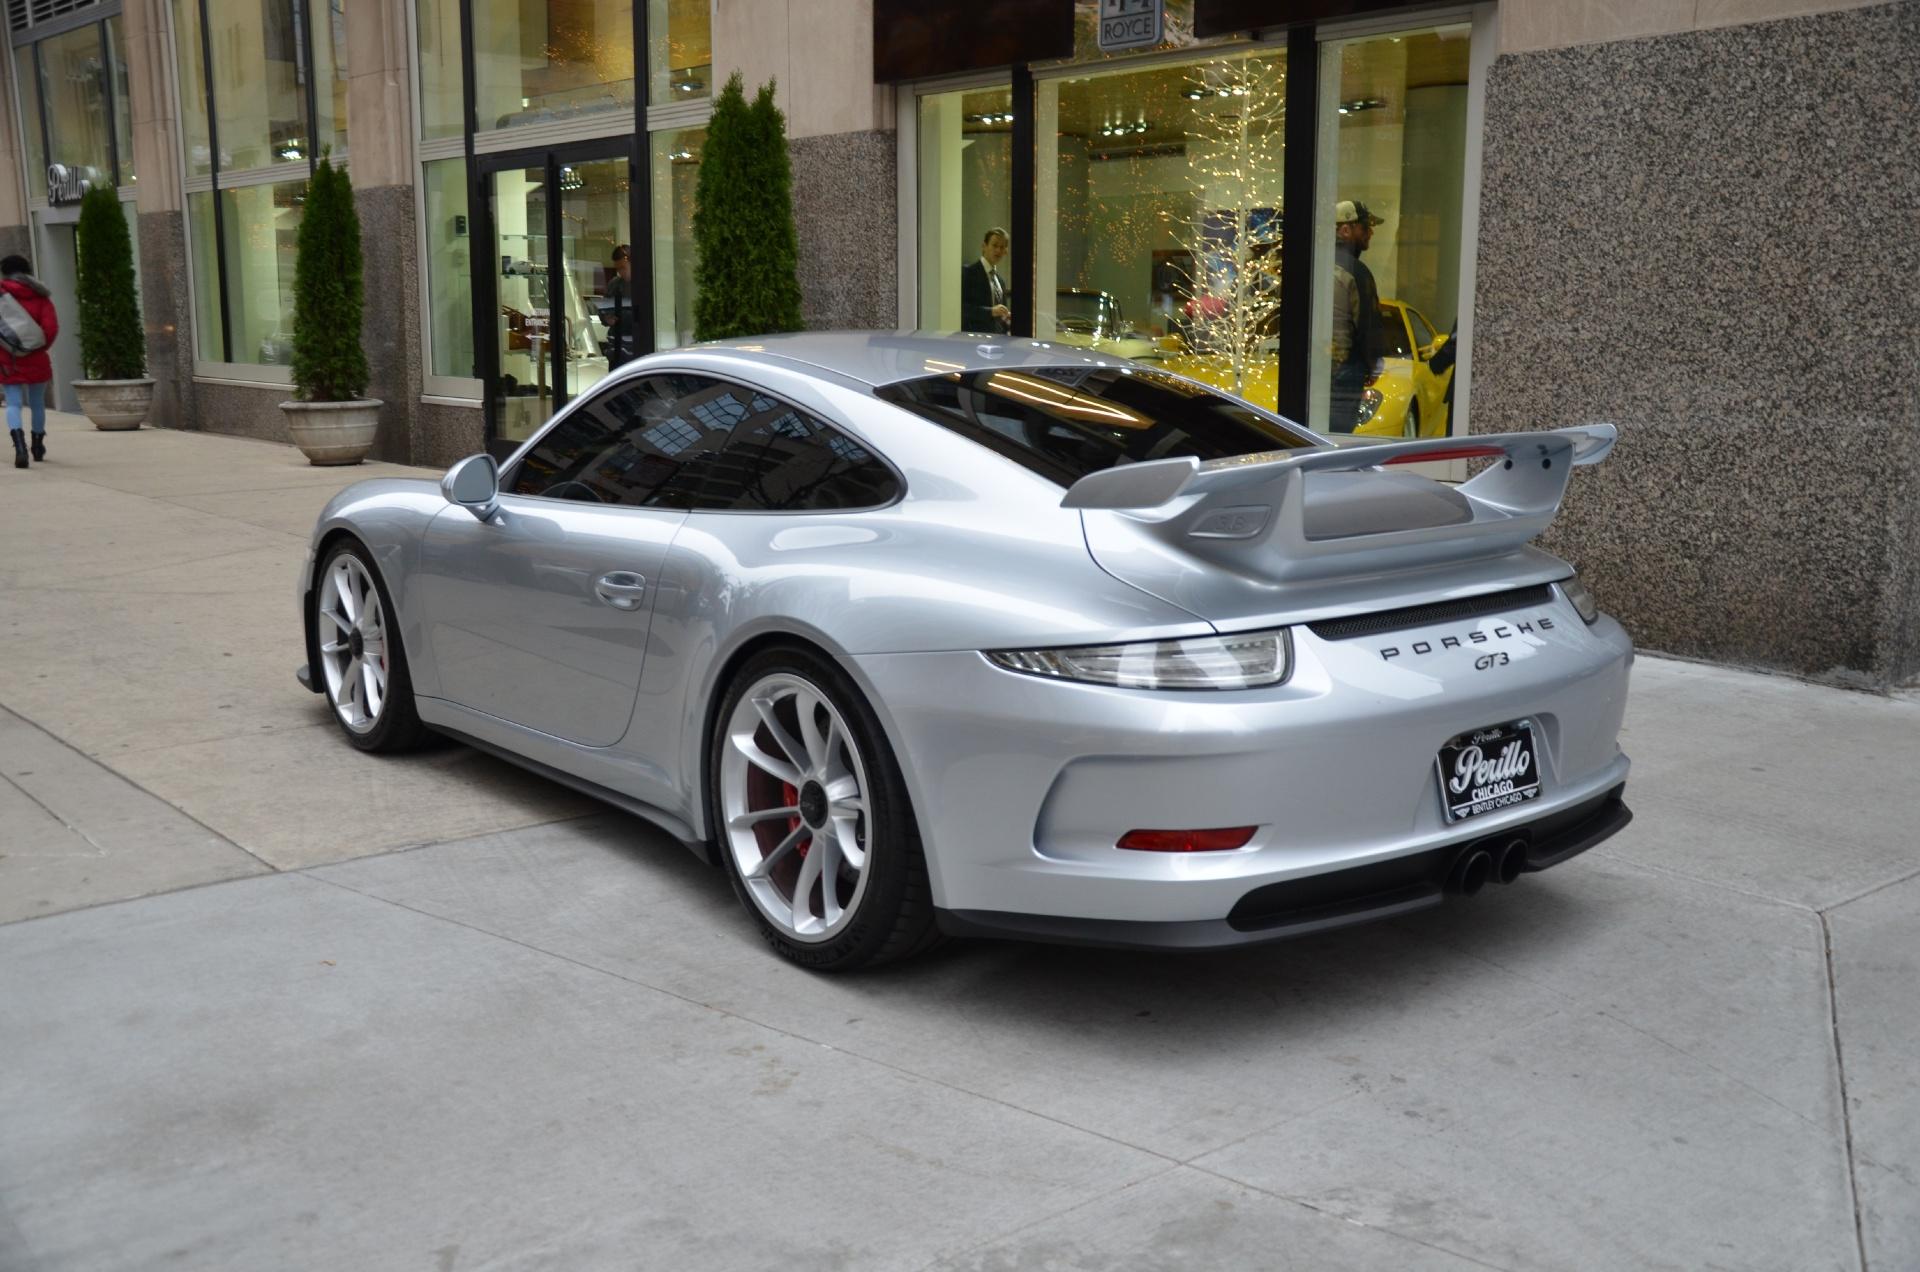 2015 Porsche 911 Gt3 Stock 84223 For Sale Near Chicago